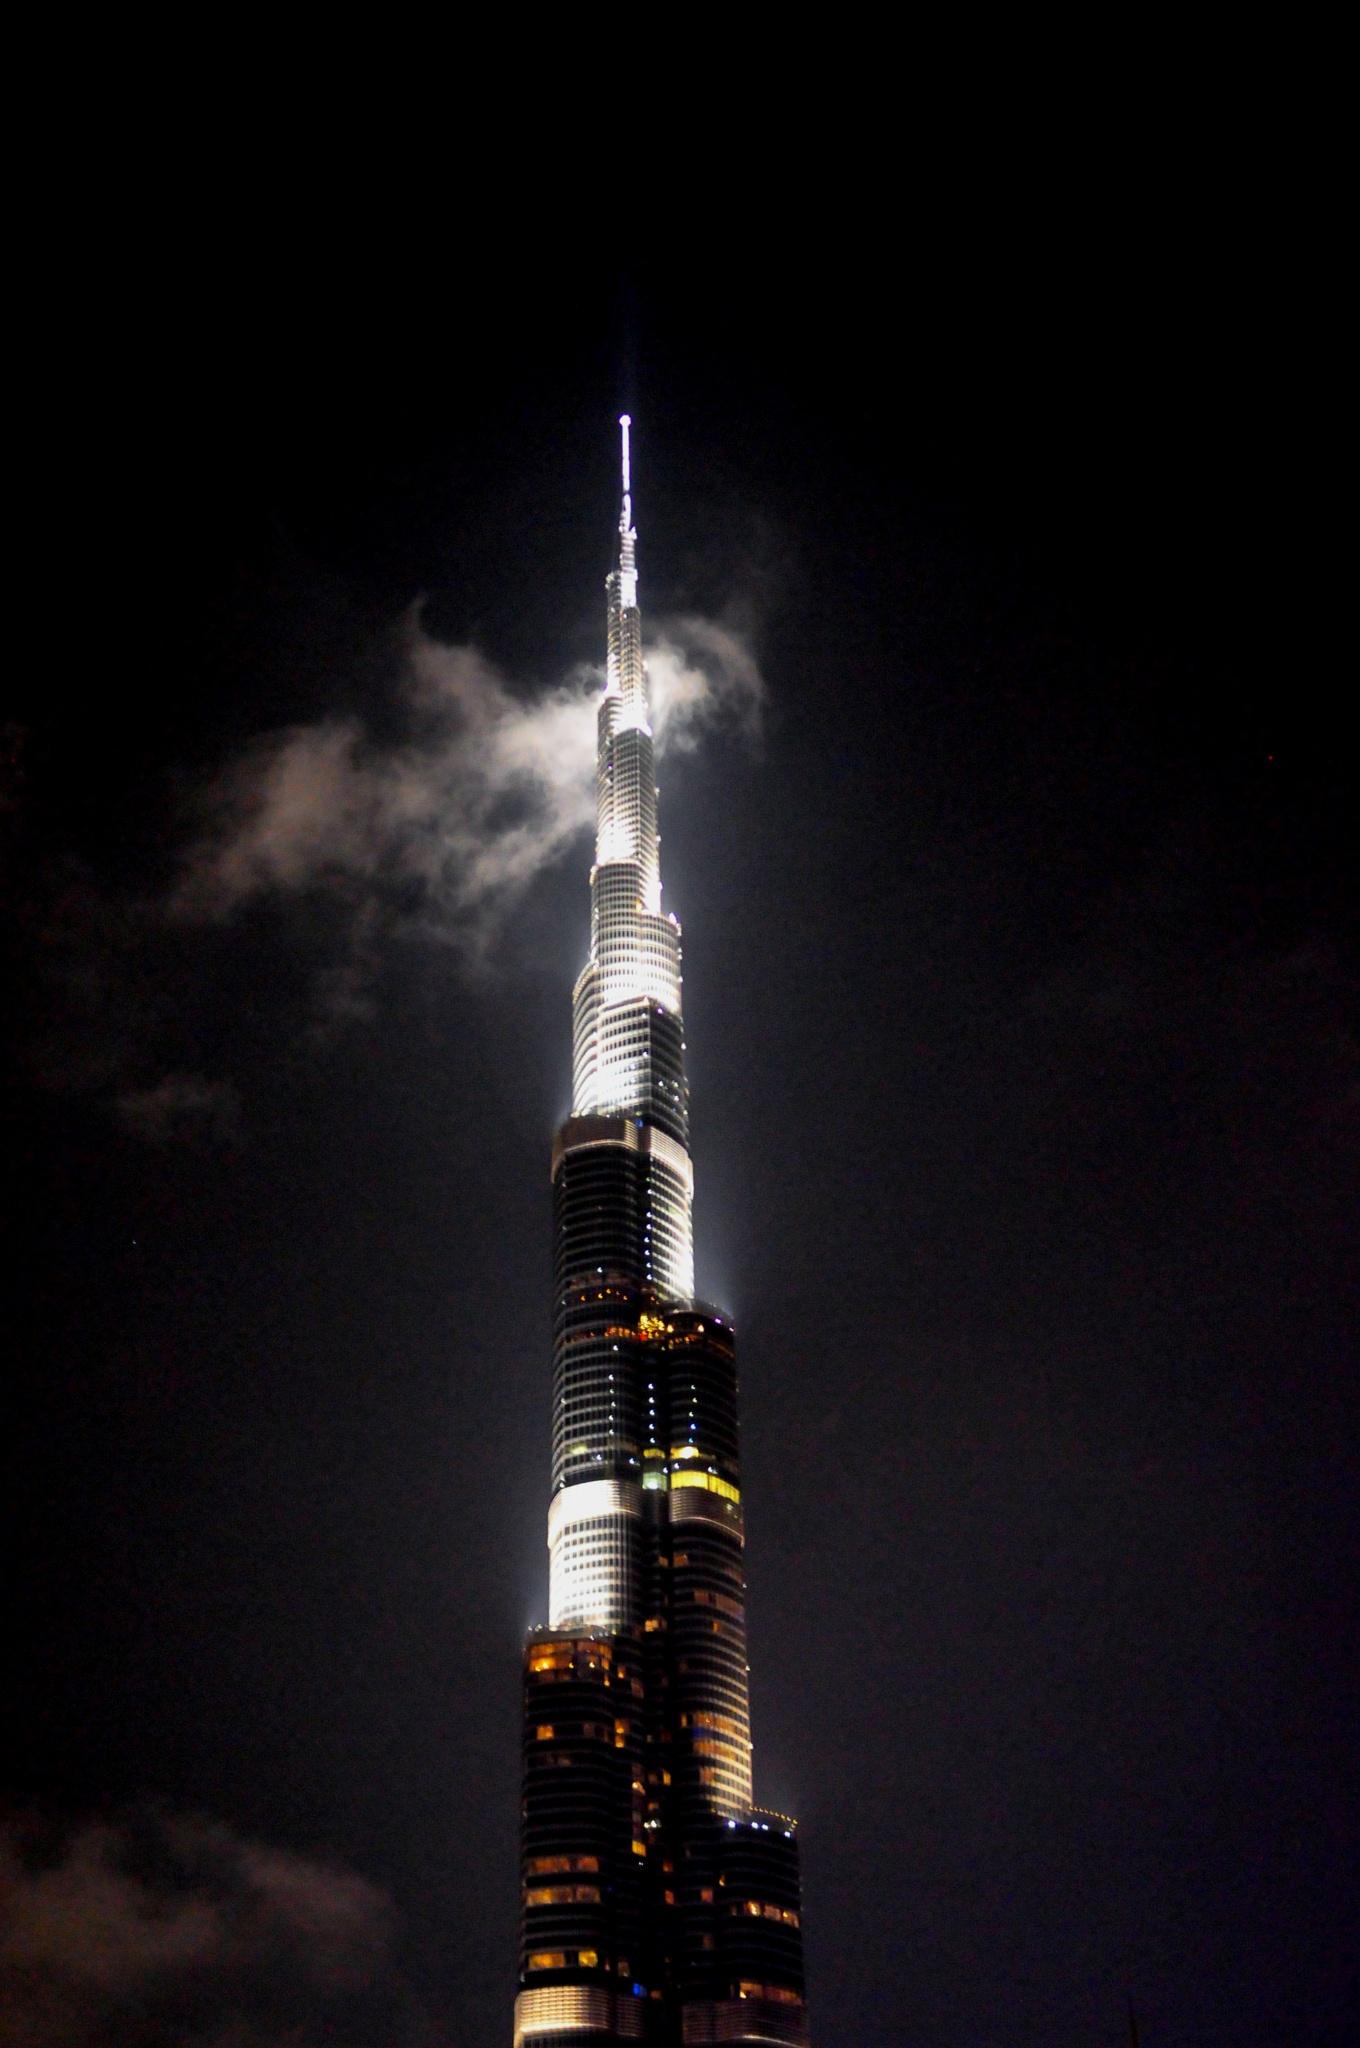 burj khalifa at a night by jimeier f.